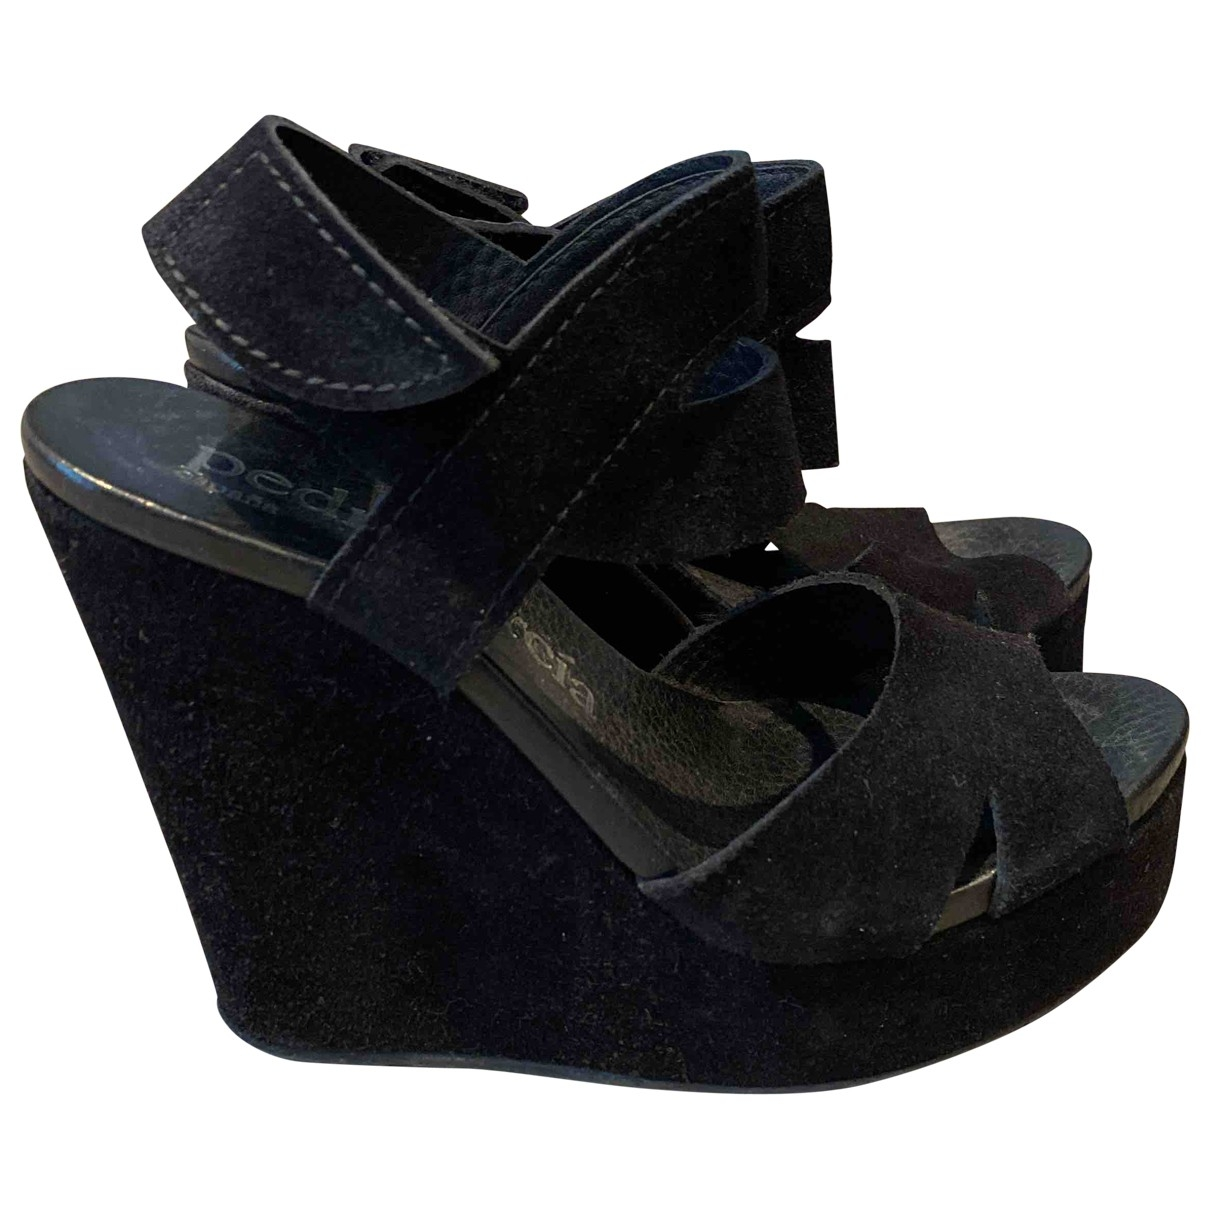 Pedro Garcia \N Black Suede Sandals for Women 37 EU